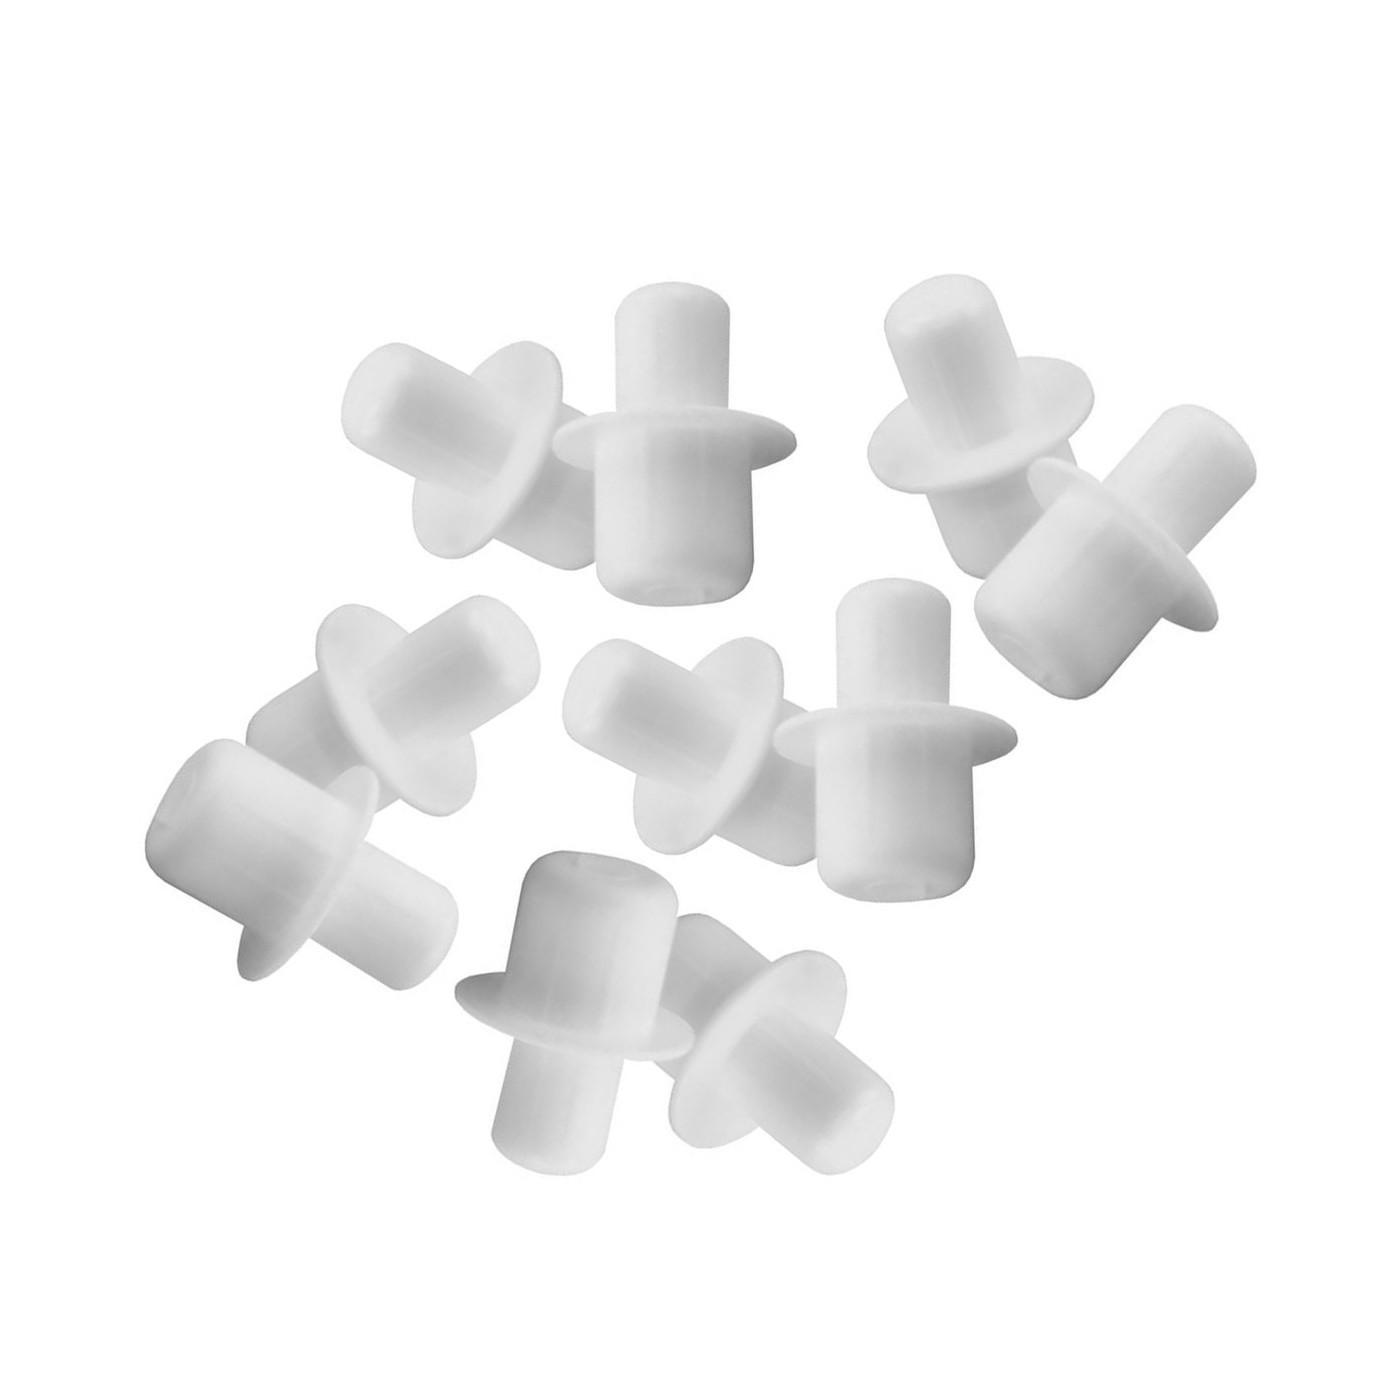 Set of 120 plastic shelf supports (white, 5&6 mm, 15 mm length)